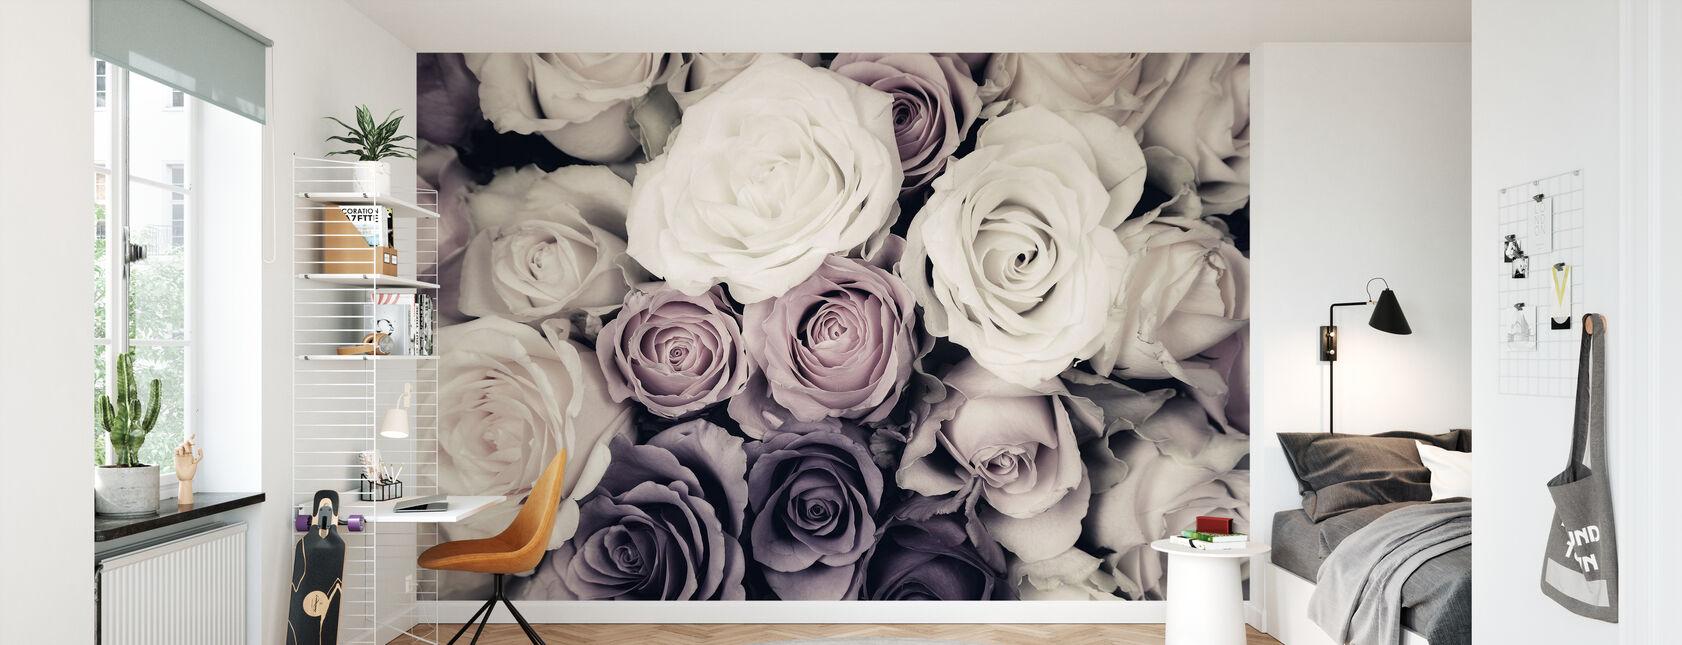 Dark Roses - Wallpaper - Kids Room